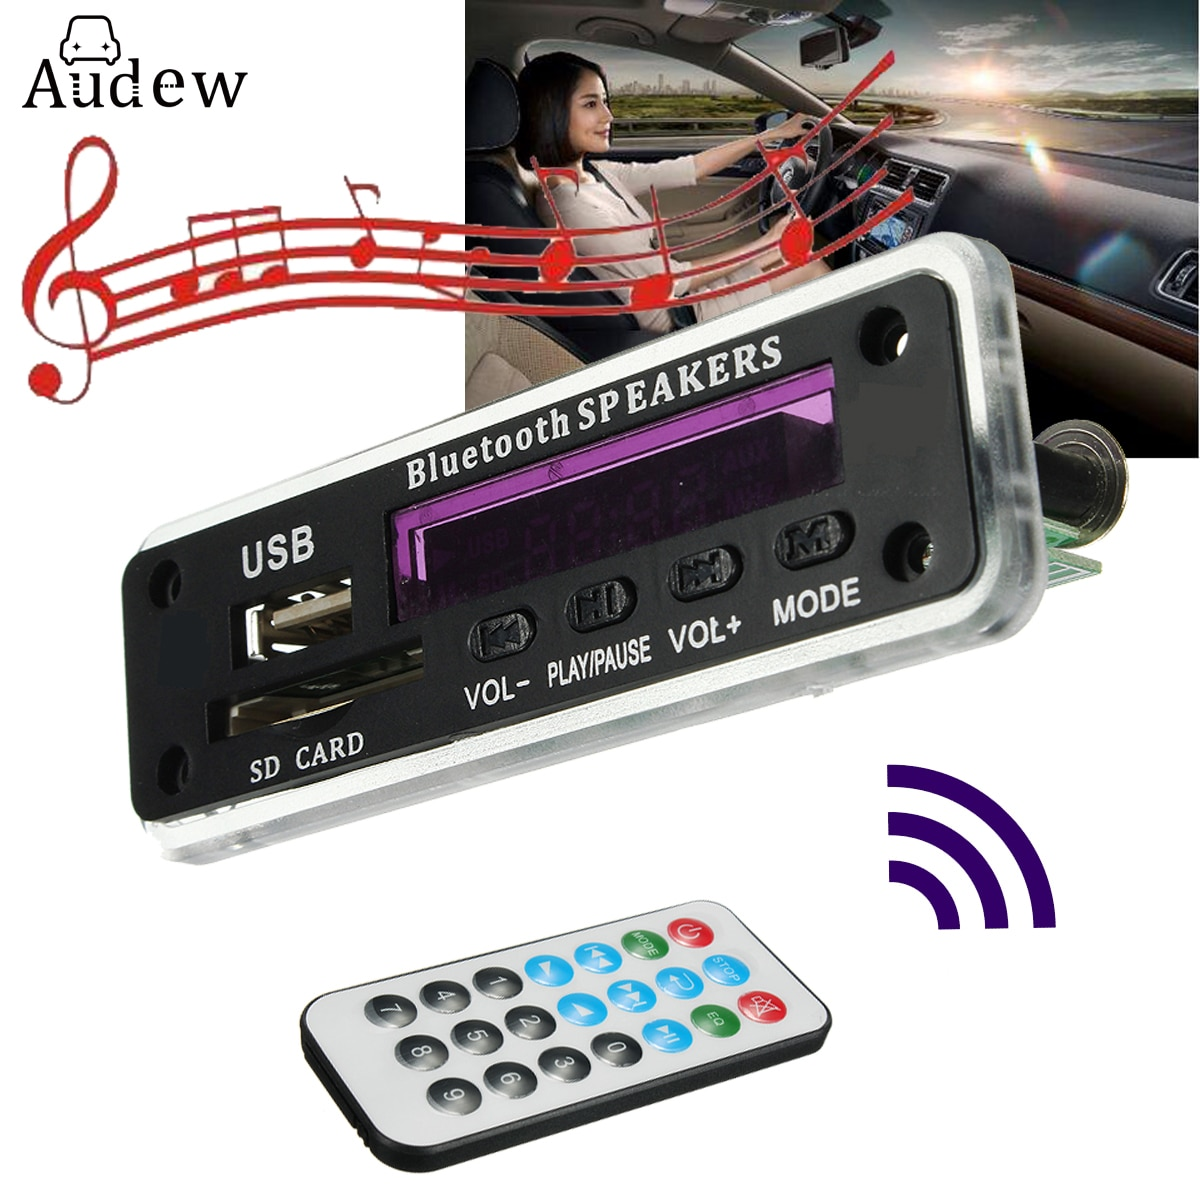 LEORY bluetooth MP3 Decoder Board Audio Modul Wireless 12V MP3 WMA DAC Decodierung Bord Mit Fernbedienung USB SD Karte FM Radio Für Auto